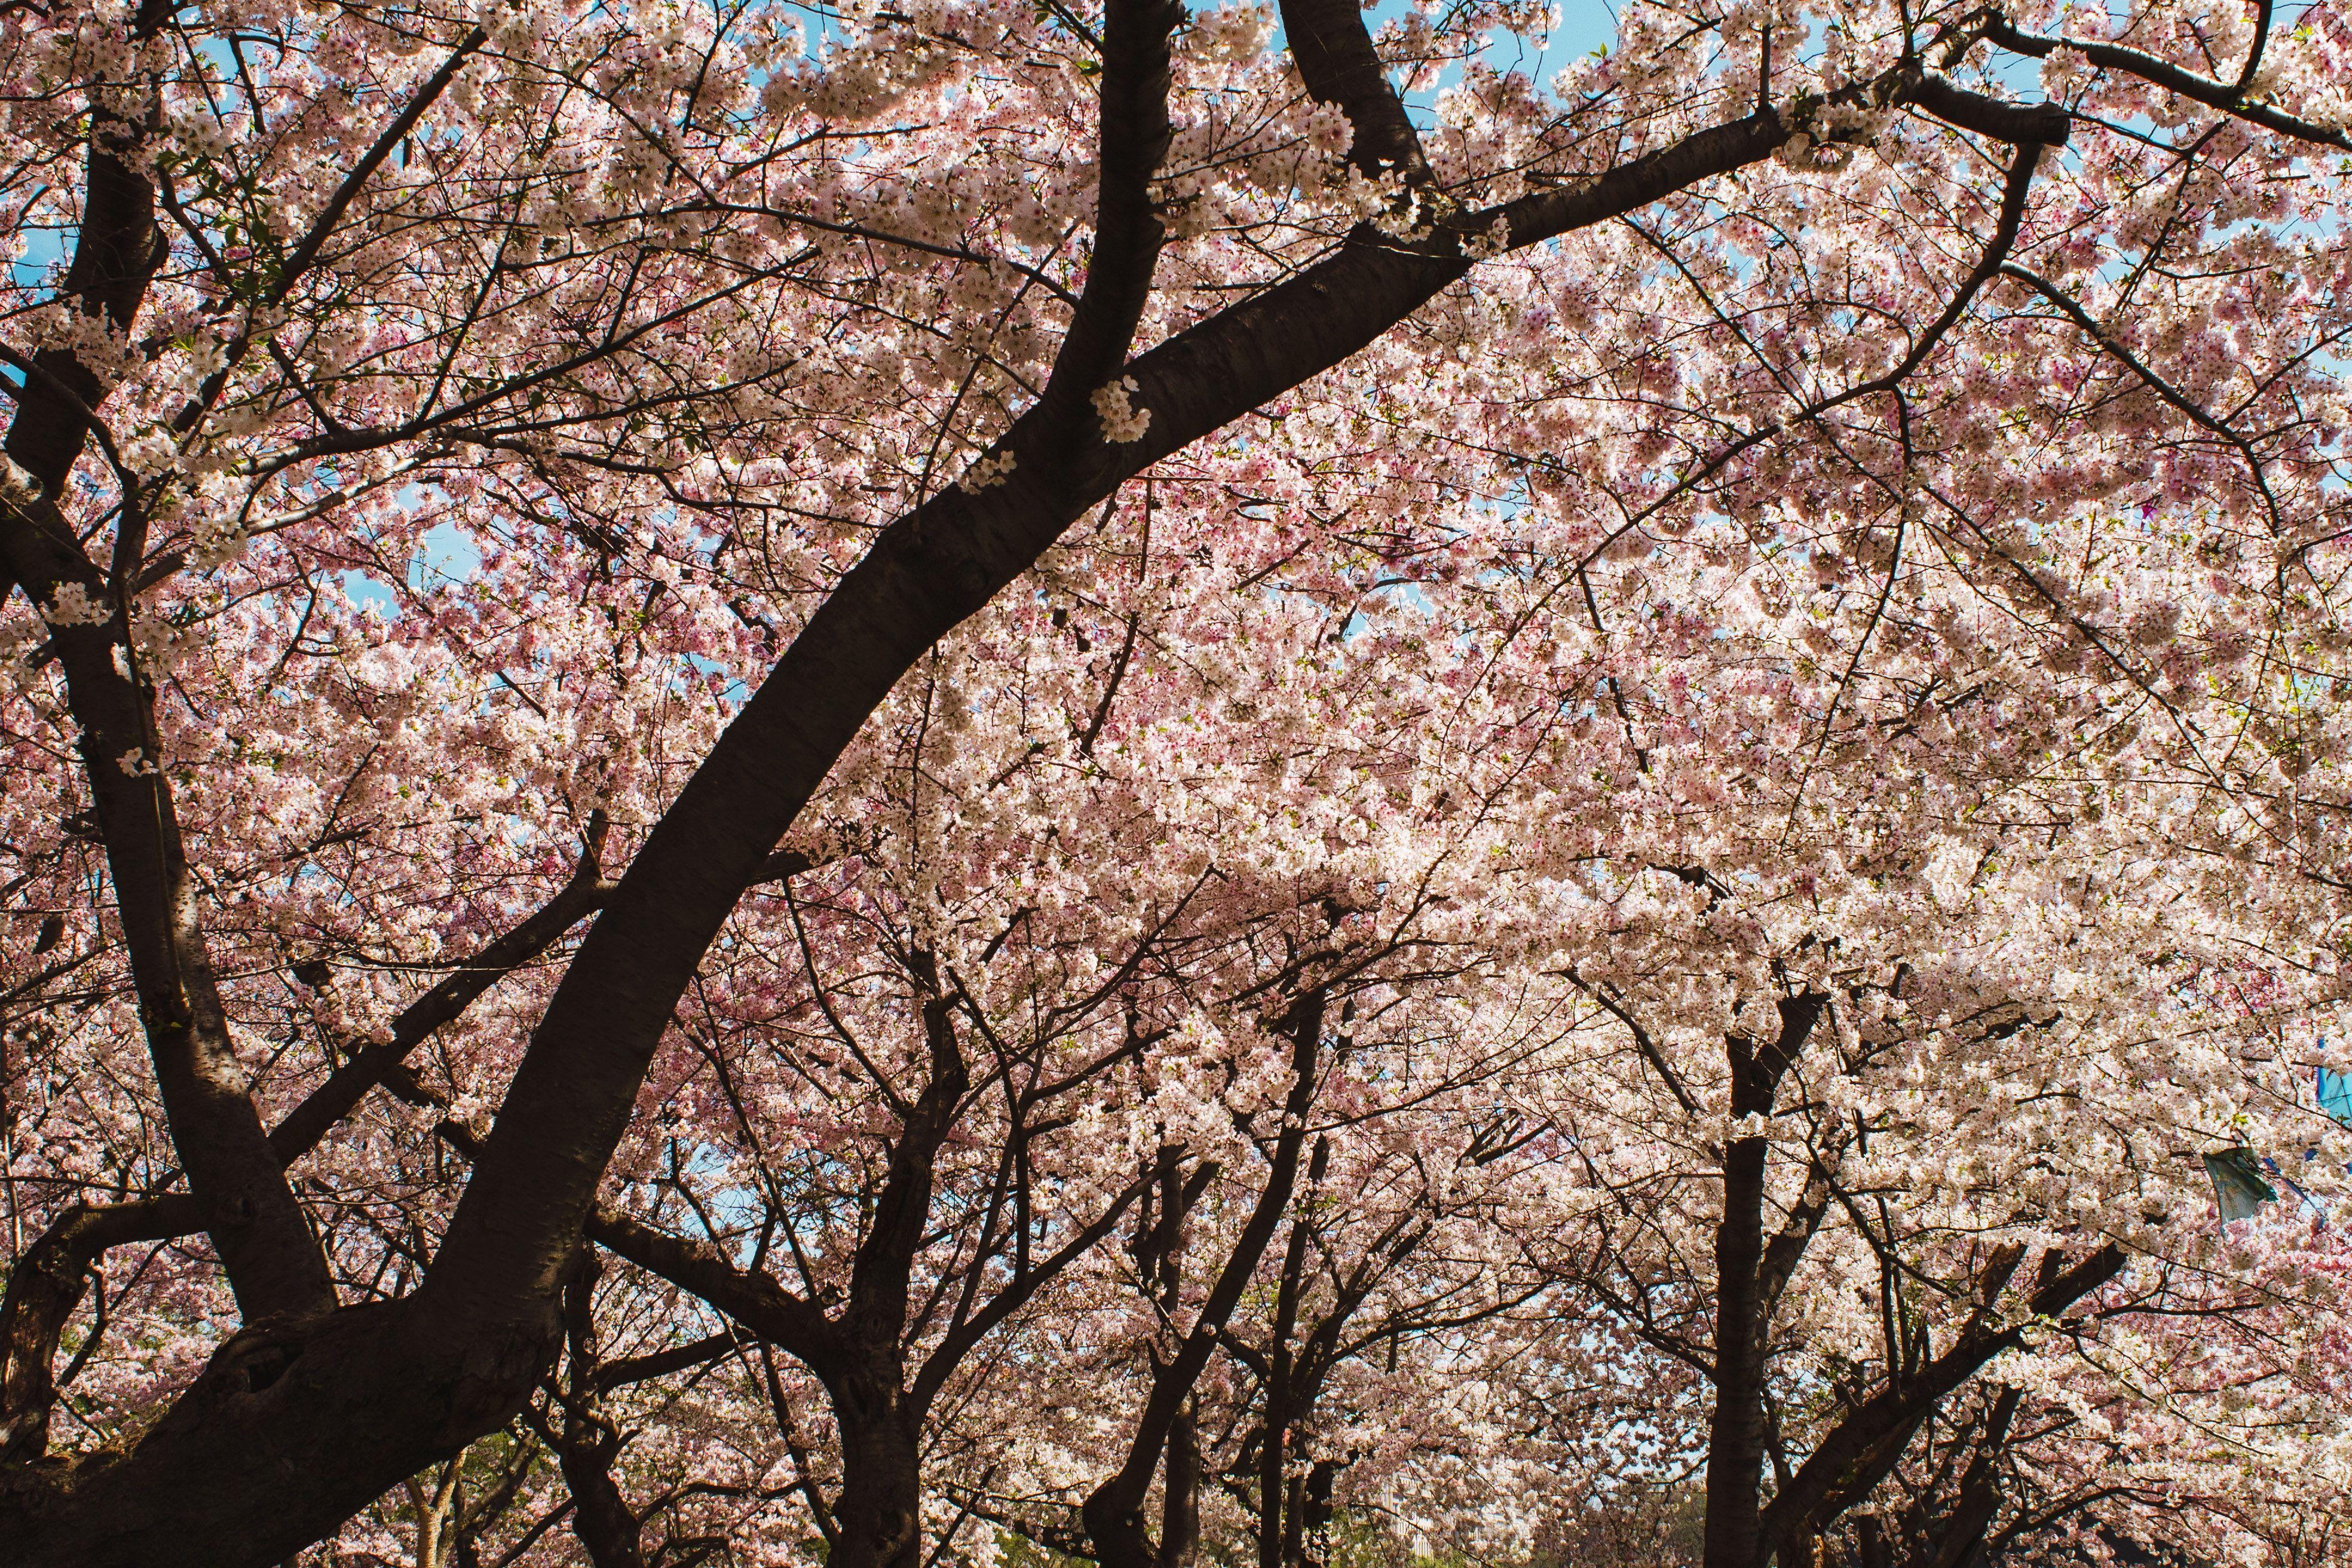 Best Ways To Enjoy The Washington D C Cherry Blossom Festival Cherry Blossom Festival Cherry Blossom Blossom